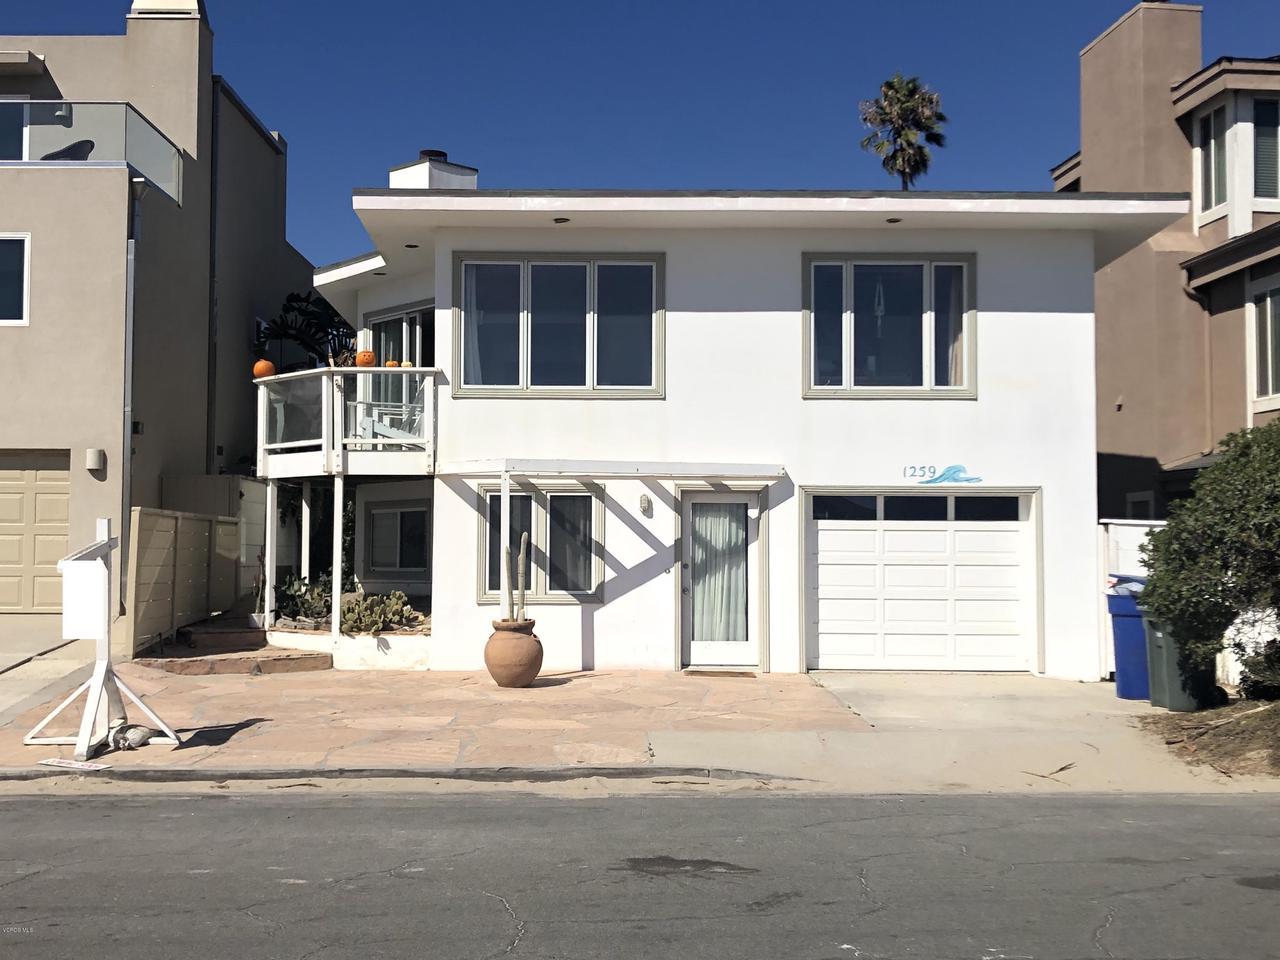 Photo of 1259 NEW BEDFORD Court, Ventura, CA 93001